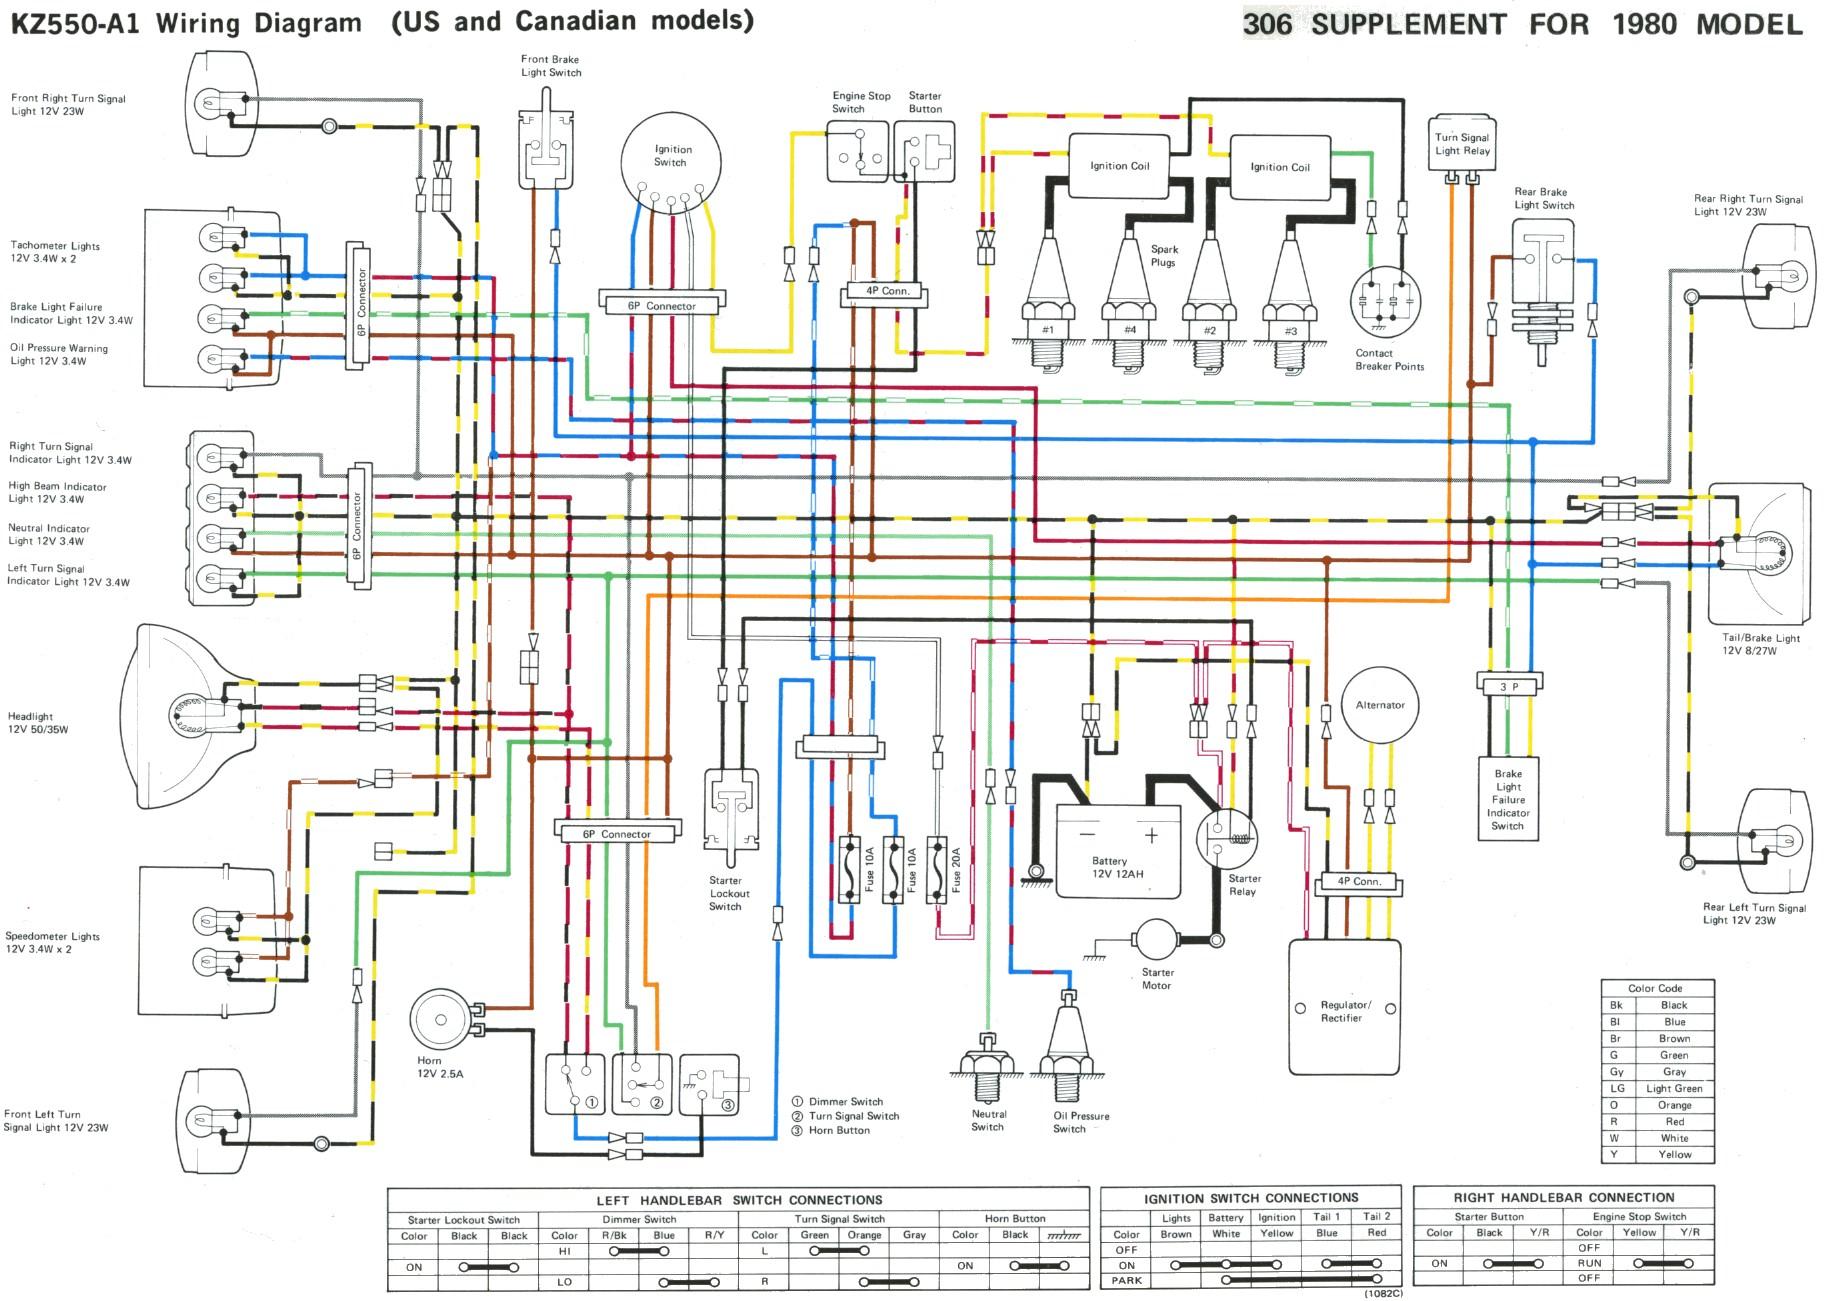 hight resolution of 1981 kz550 wiring diagram wiring diagram imp 1981 kawasaki kz750 wiring diagram 1981 kawasaki wiring diagram